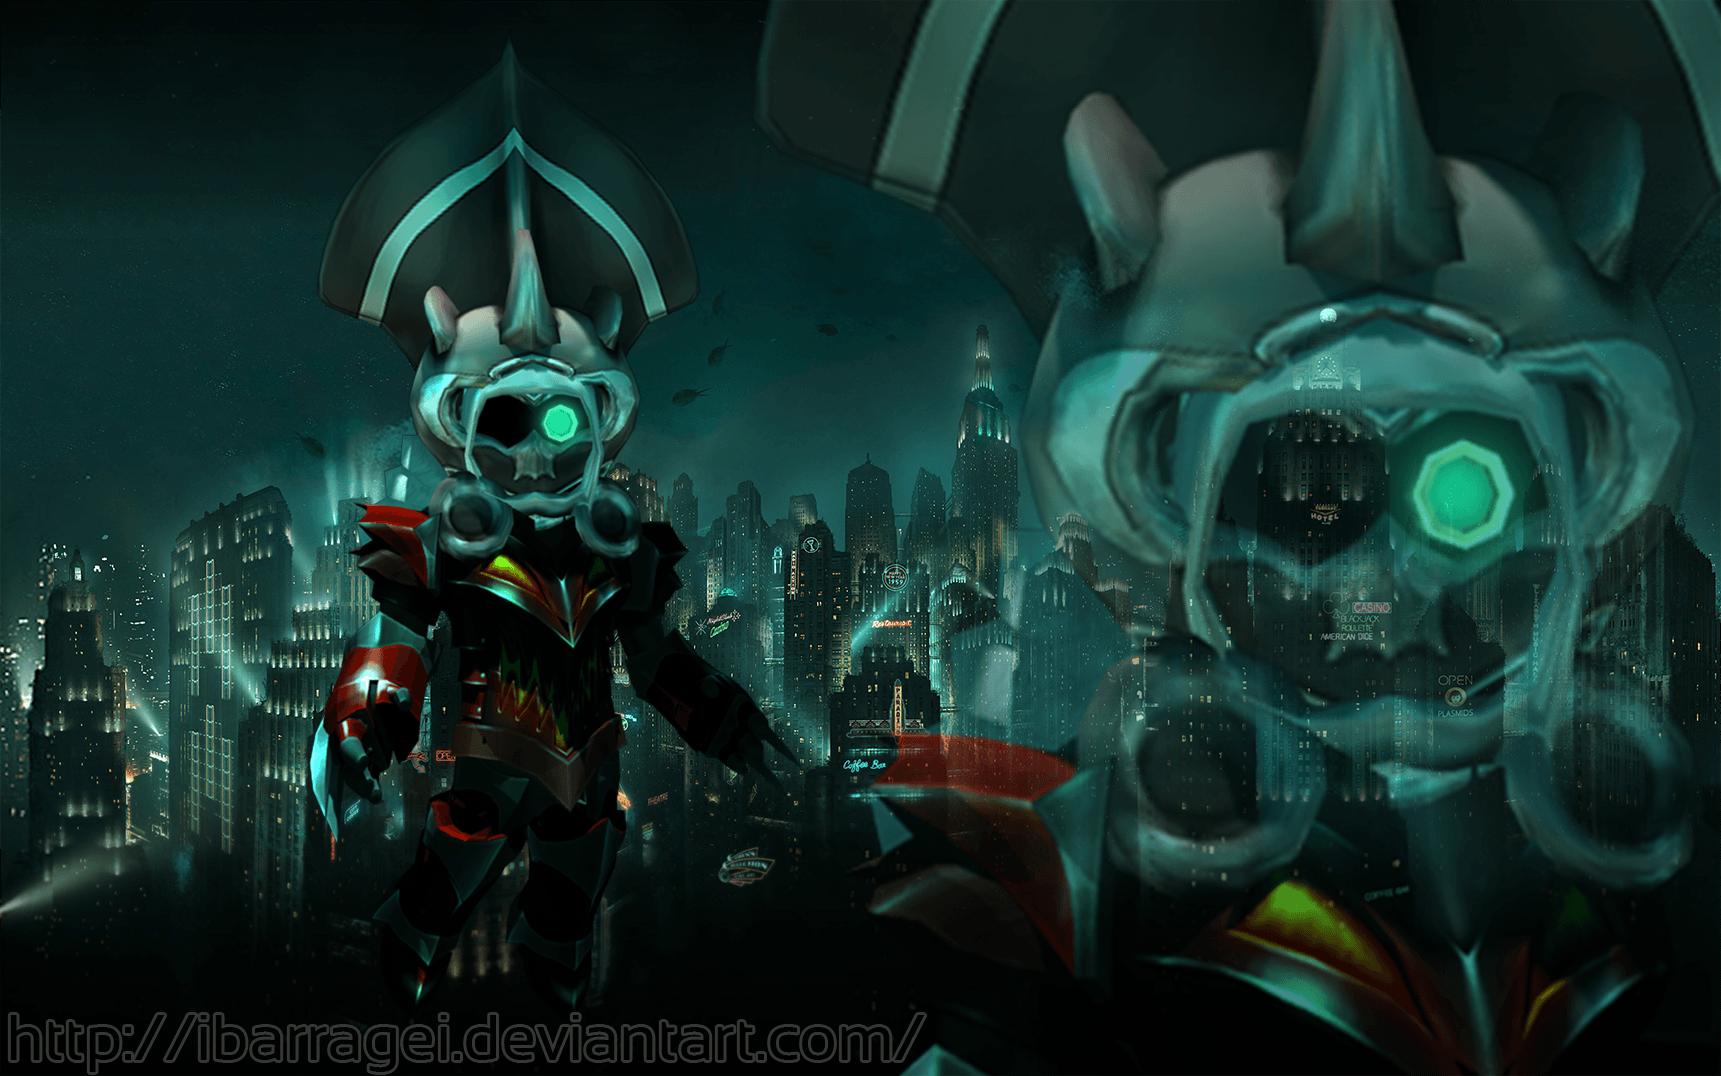 BioShock Rapture Wallpapers Group 72